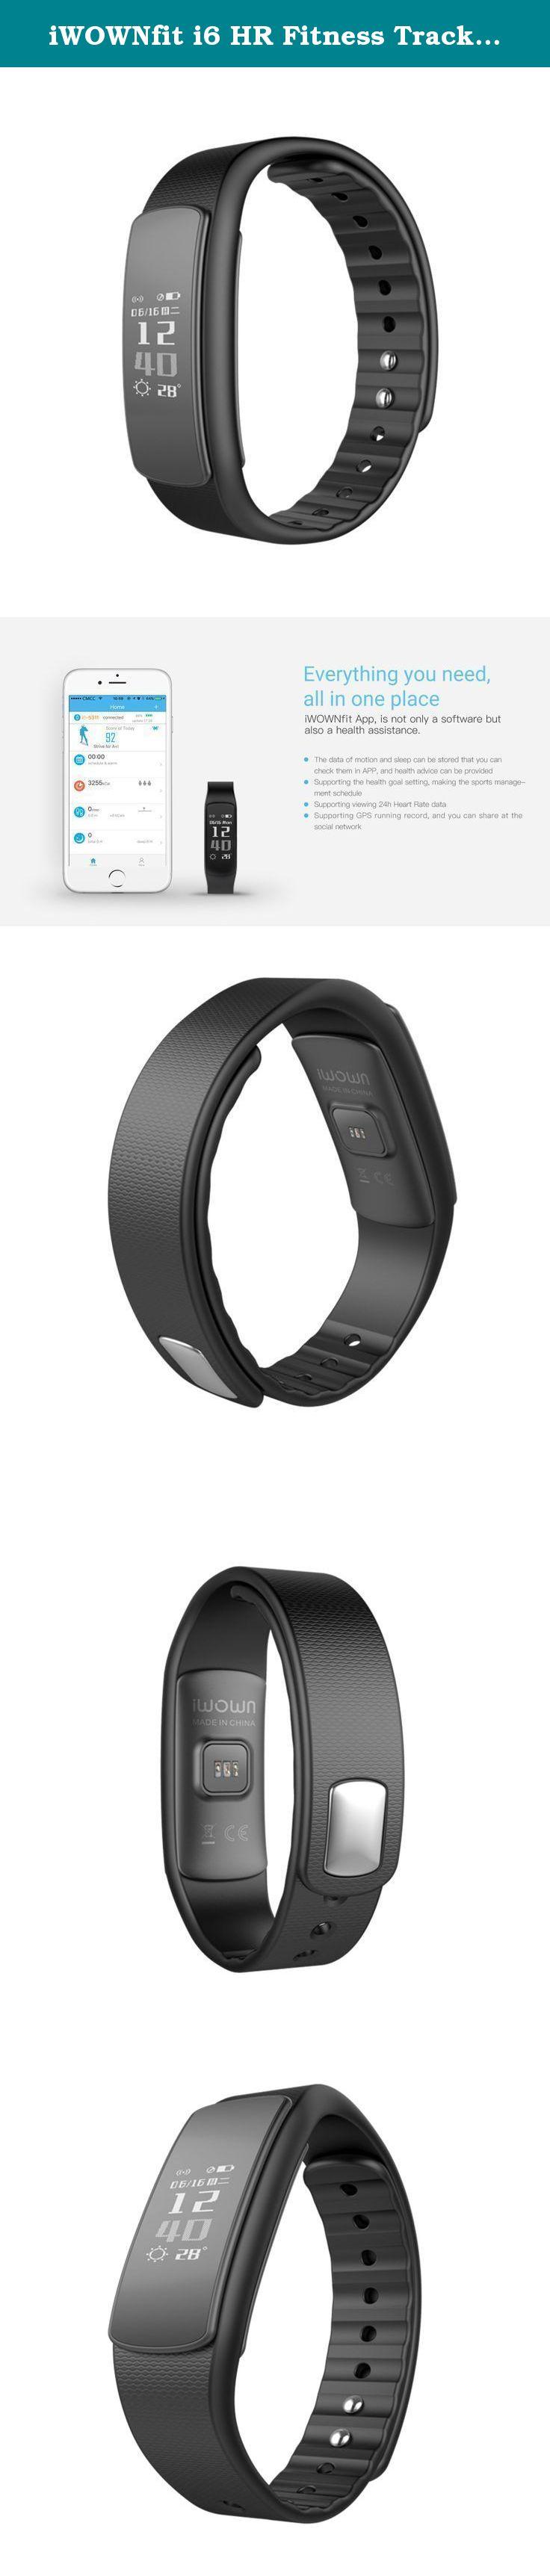 Iwownfit I6 Hr Fitness Tracker Heart Rate Monitor Smart Watch Bracelet Sport Smartband For Android Ios Cellphone Fitness Tech Fitness Watch Fitness Technology